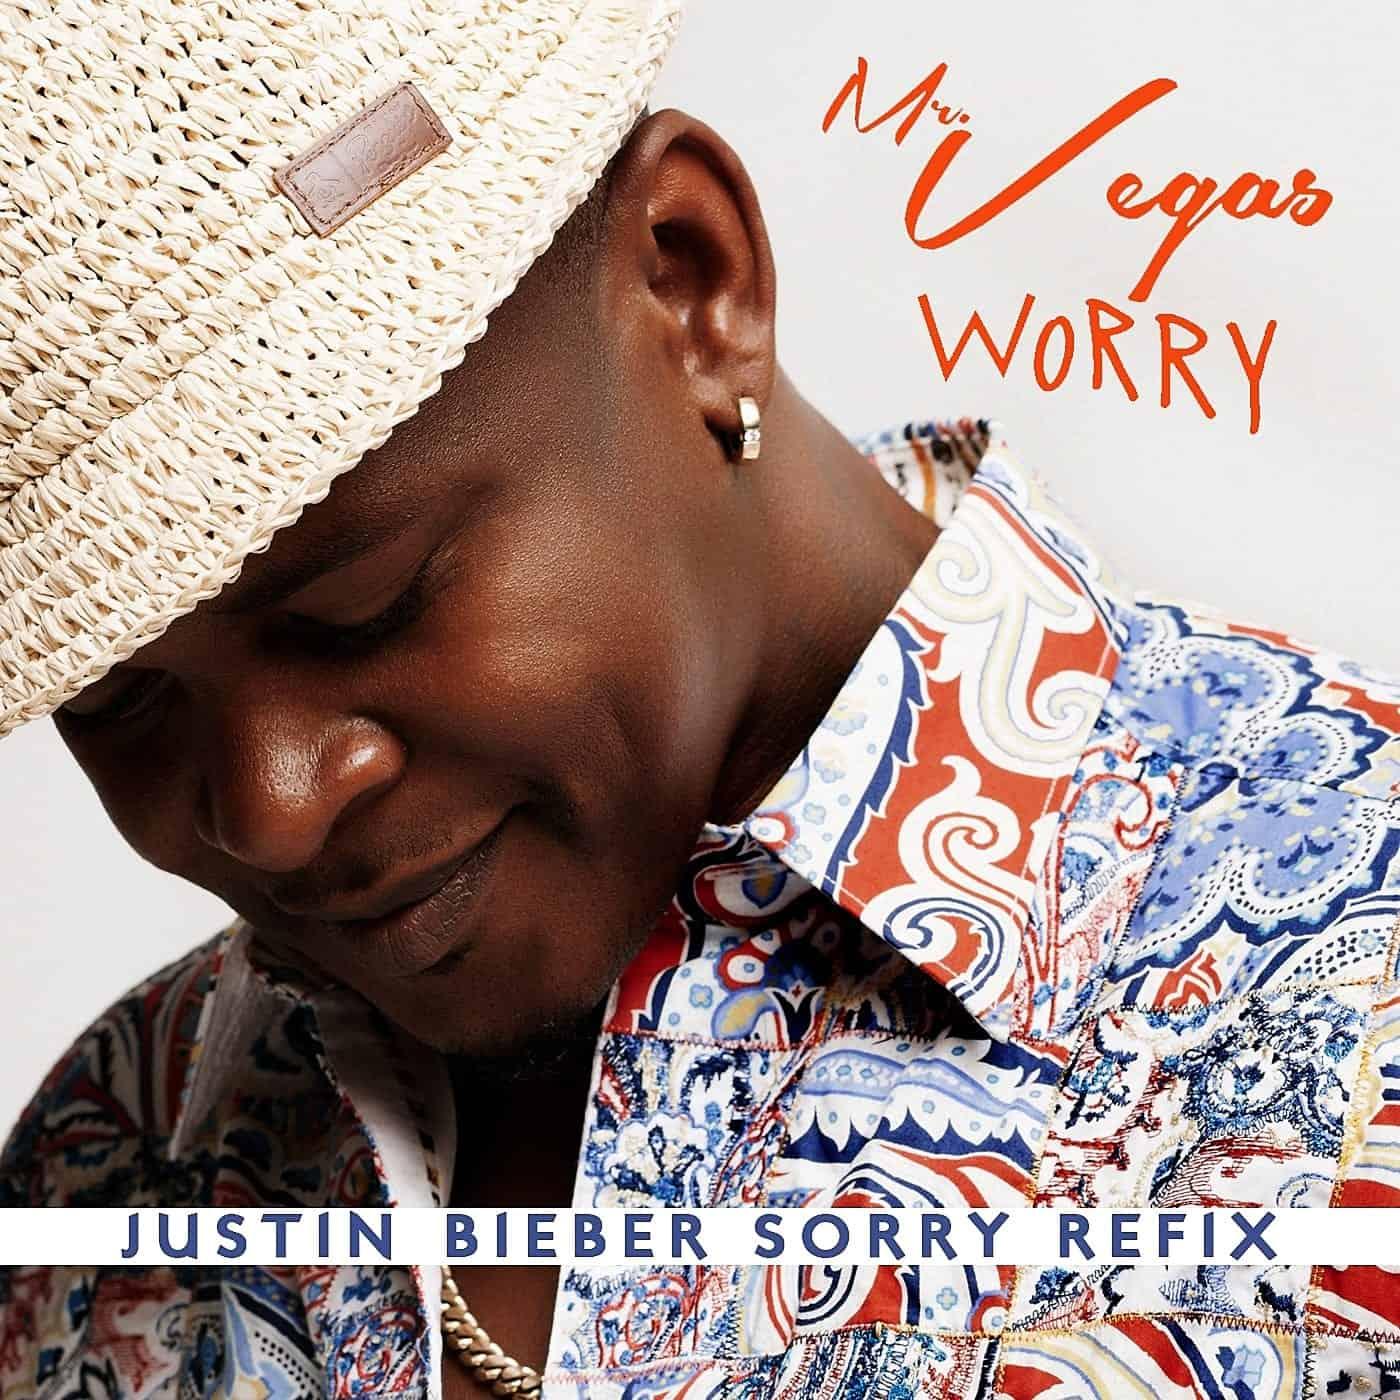 Mr Vegas - Worry - Justin Bieber Sorry Refix